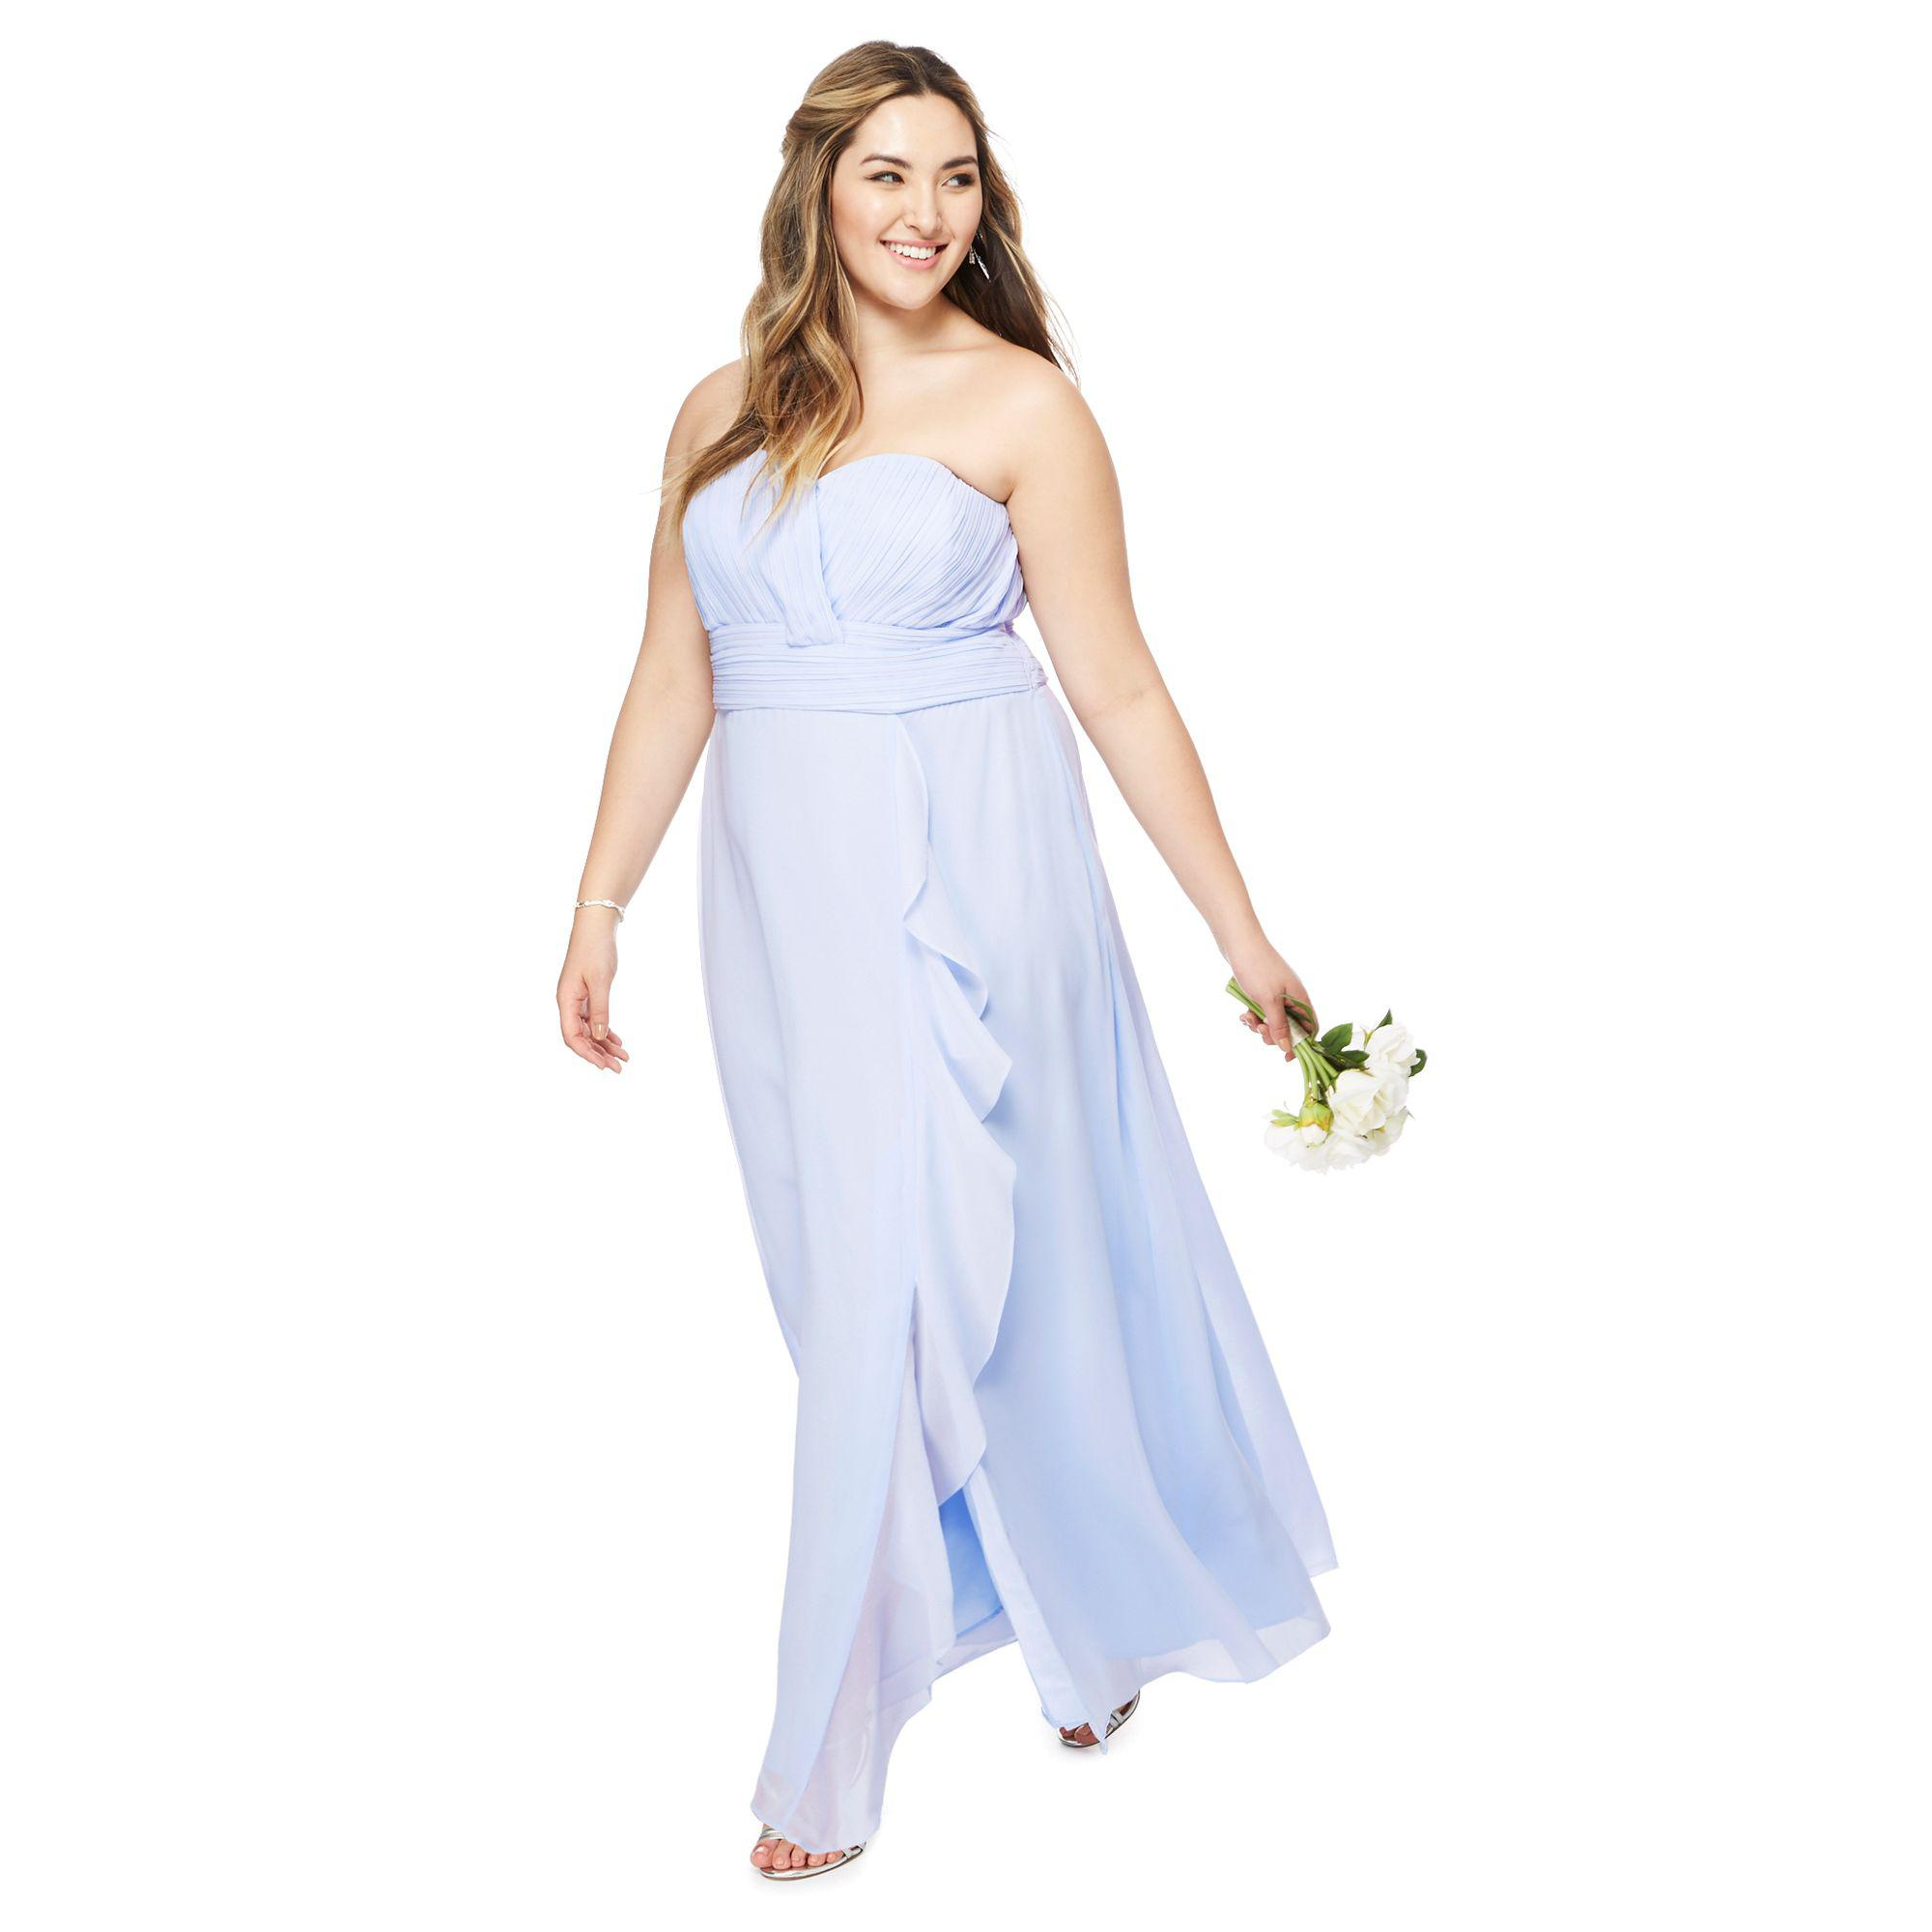 bridesmaid skirts tulle emmaline for skirt top bridesmaids dresses light blue bride lighting